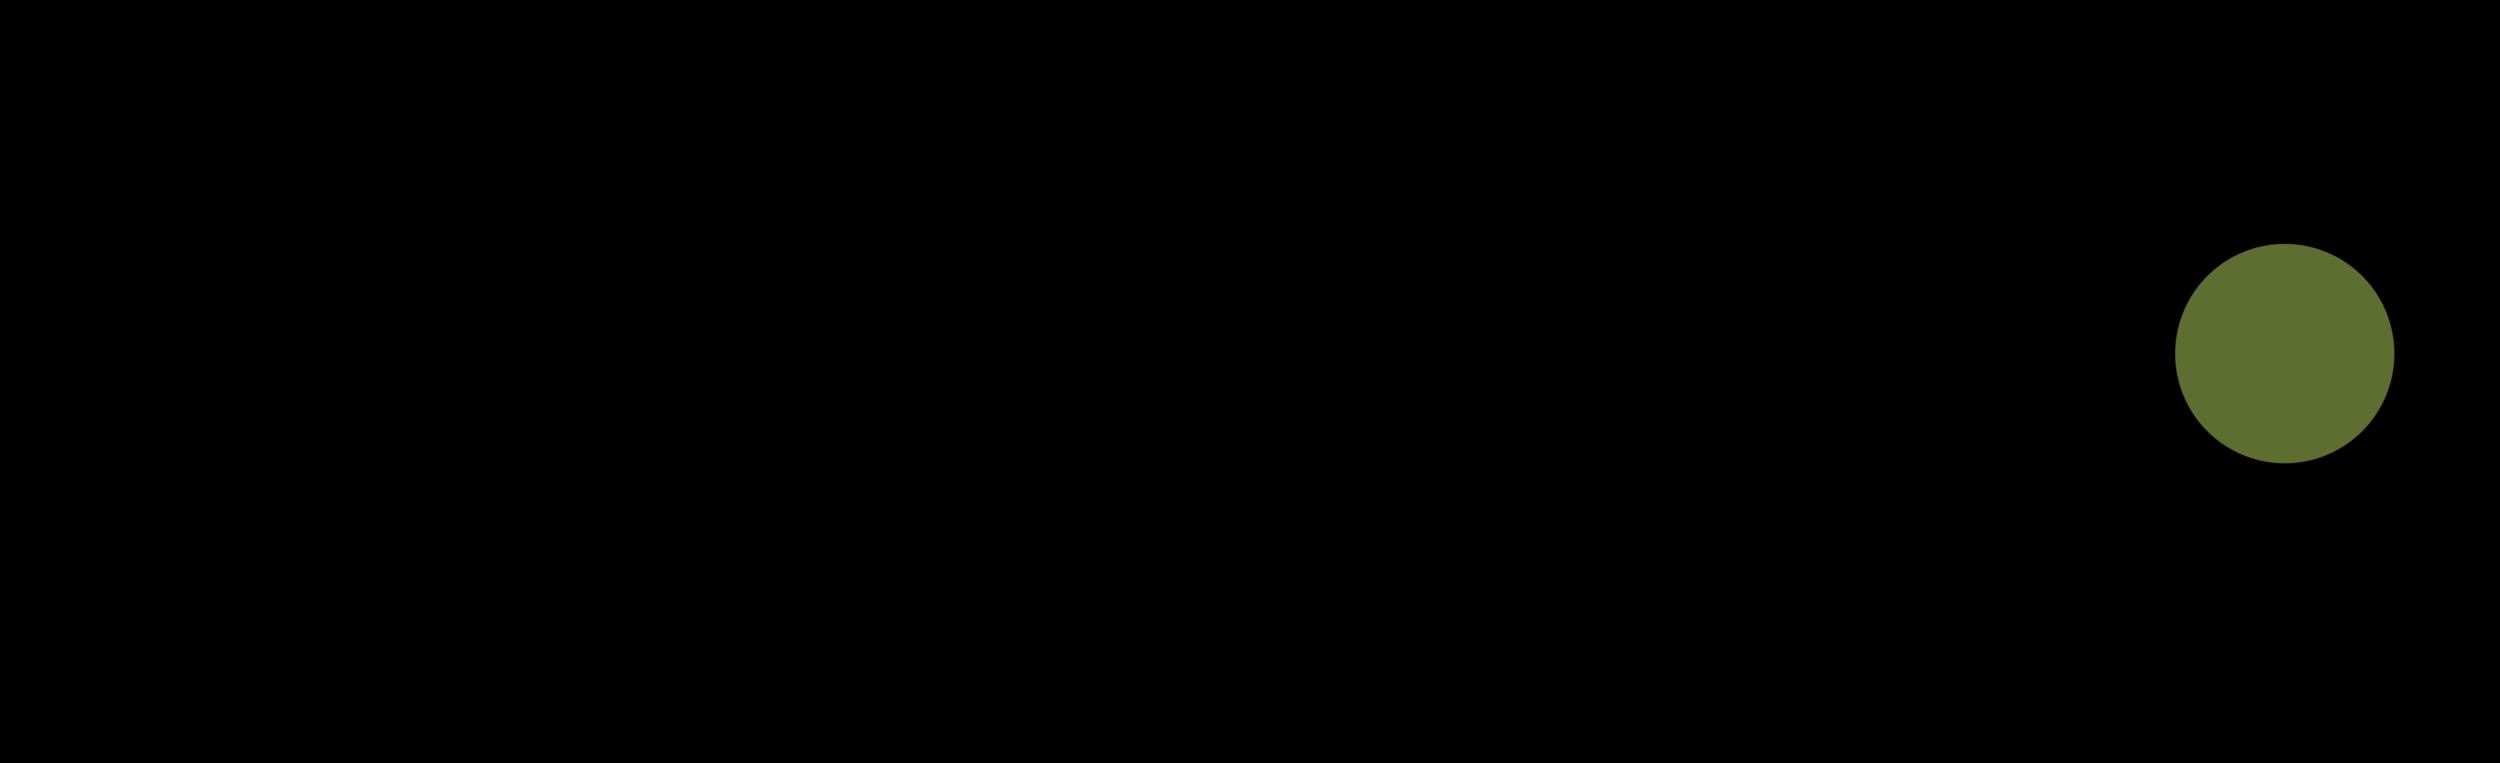 Callaloo Logo Black Transparent.png